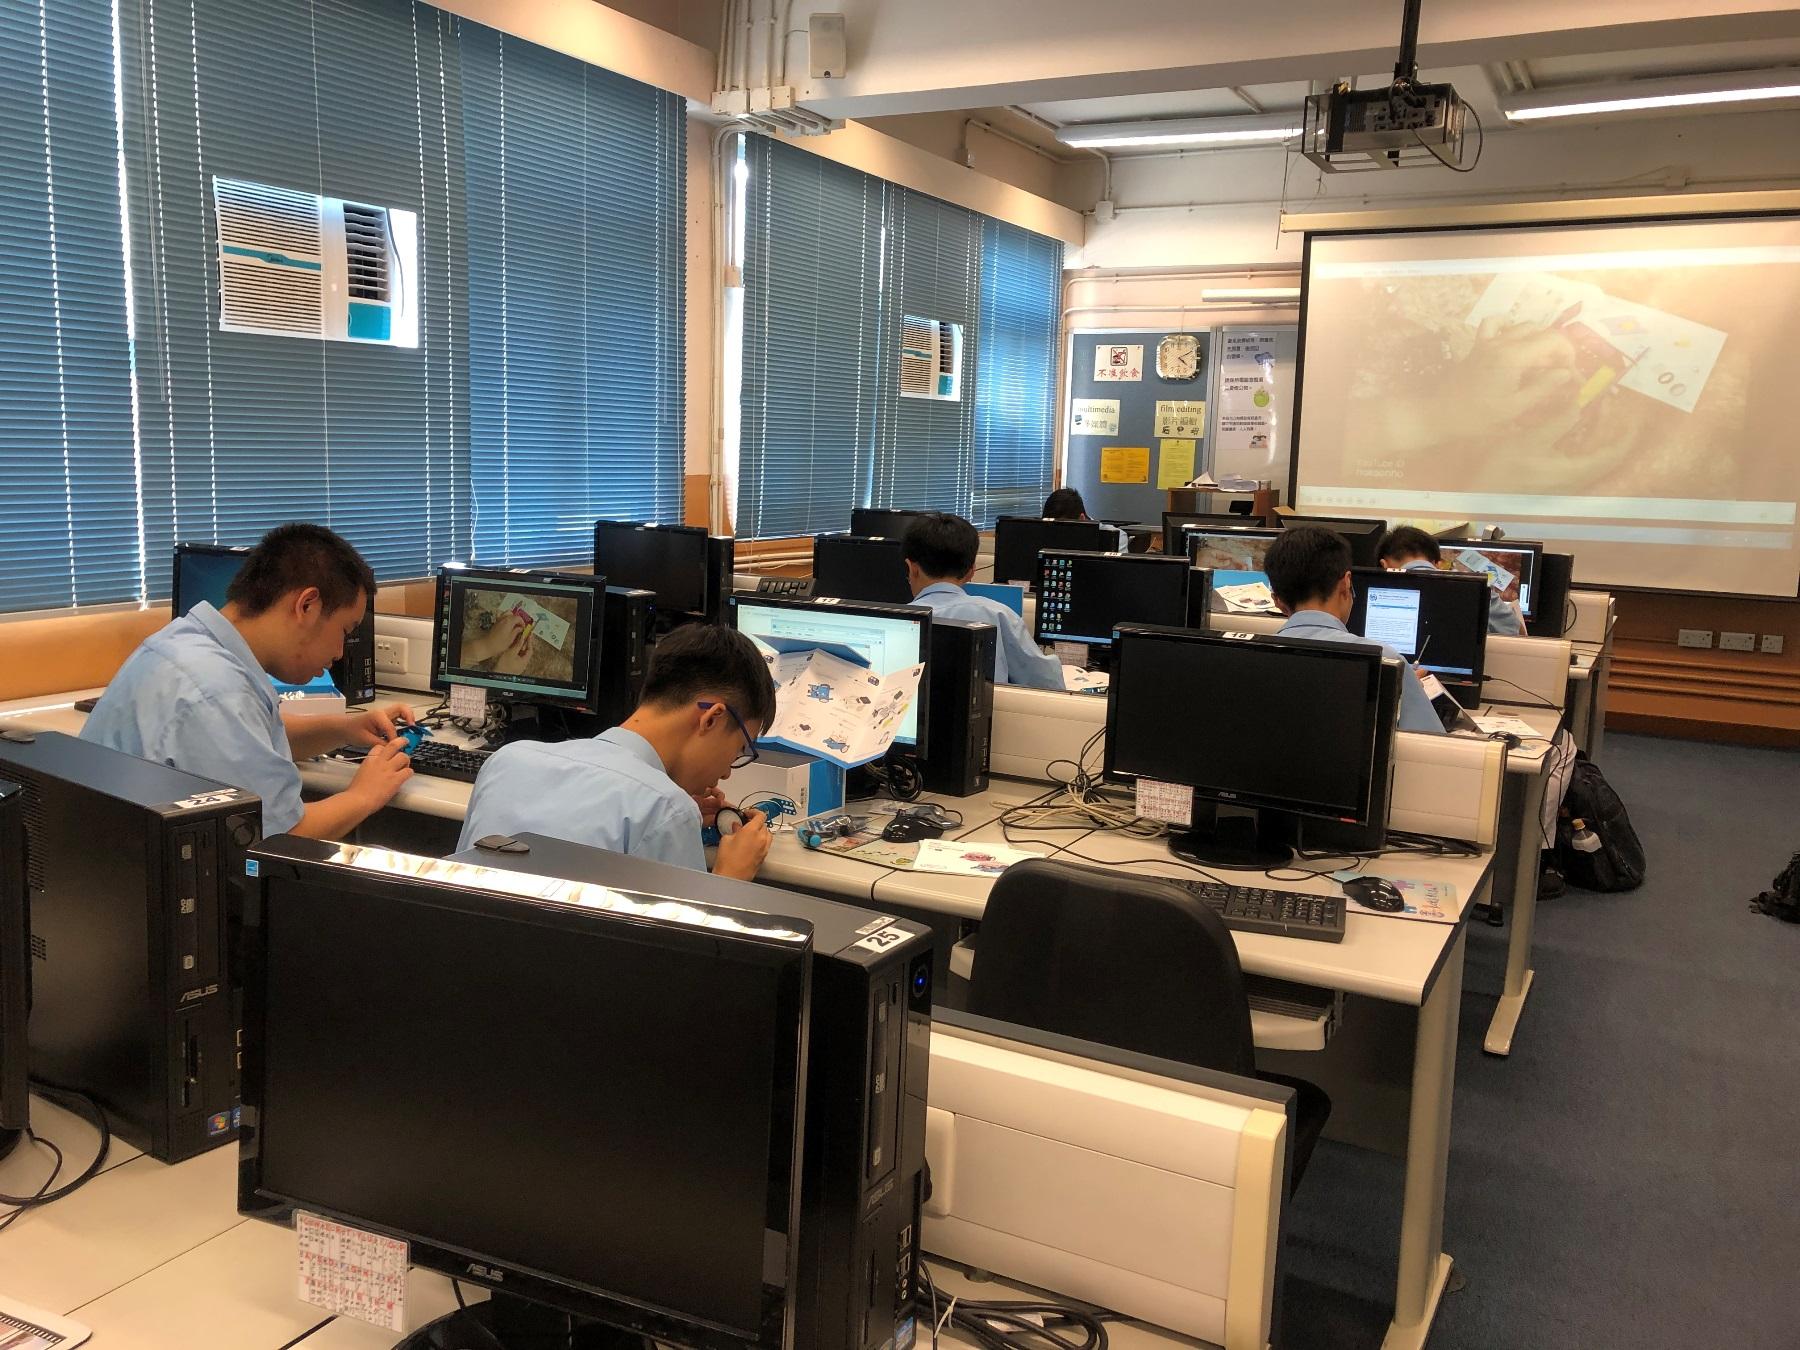 http://npc.edu.hk/sites/default/files/img_9670.jpg